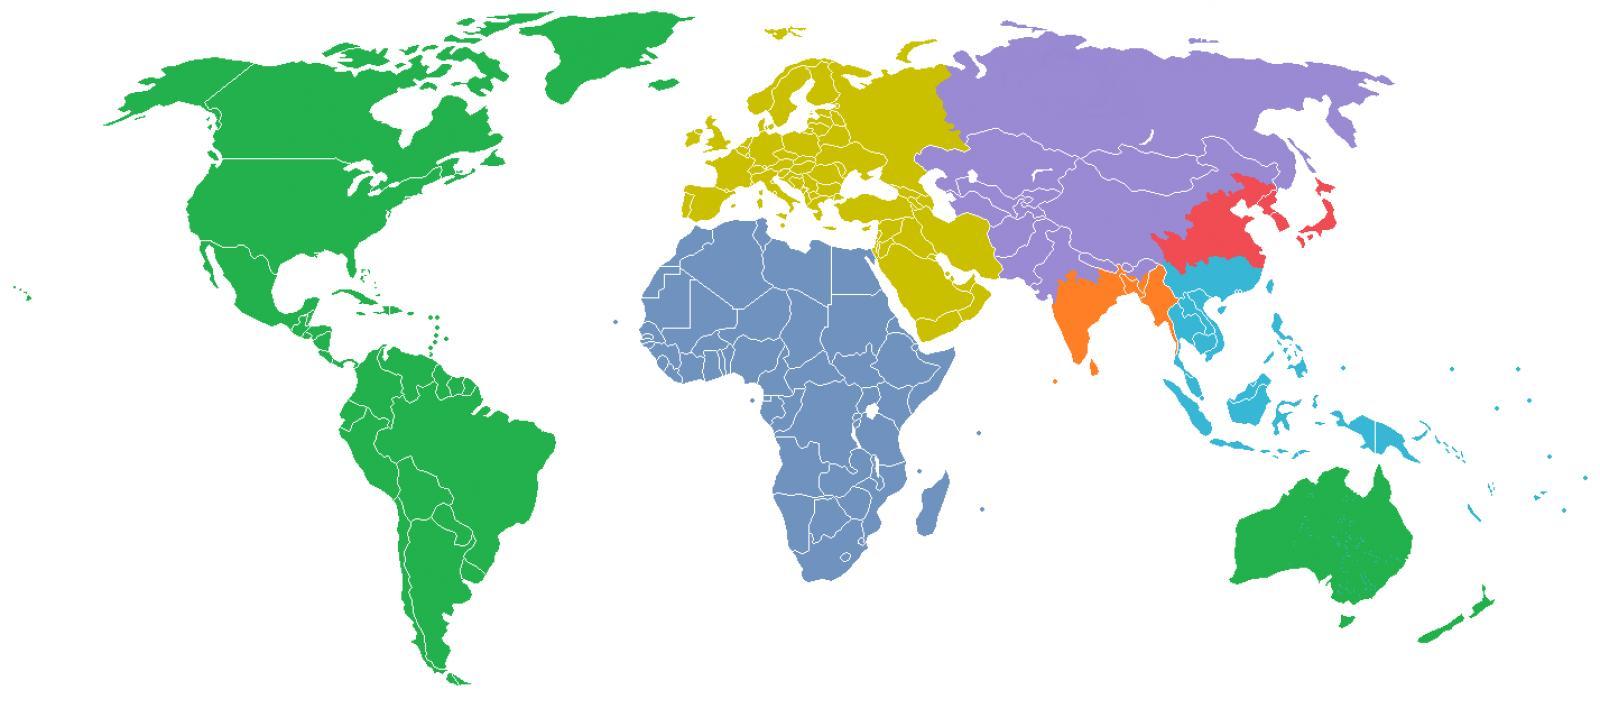 7-miljard-mensen-verdeeld-1519